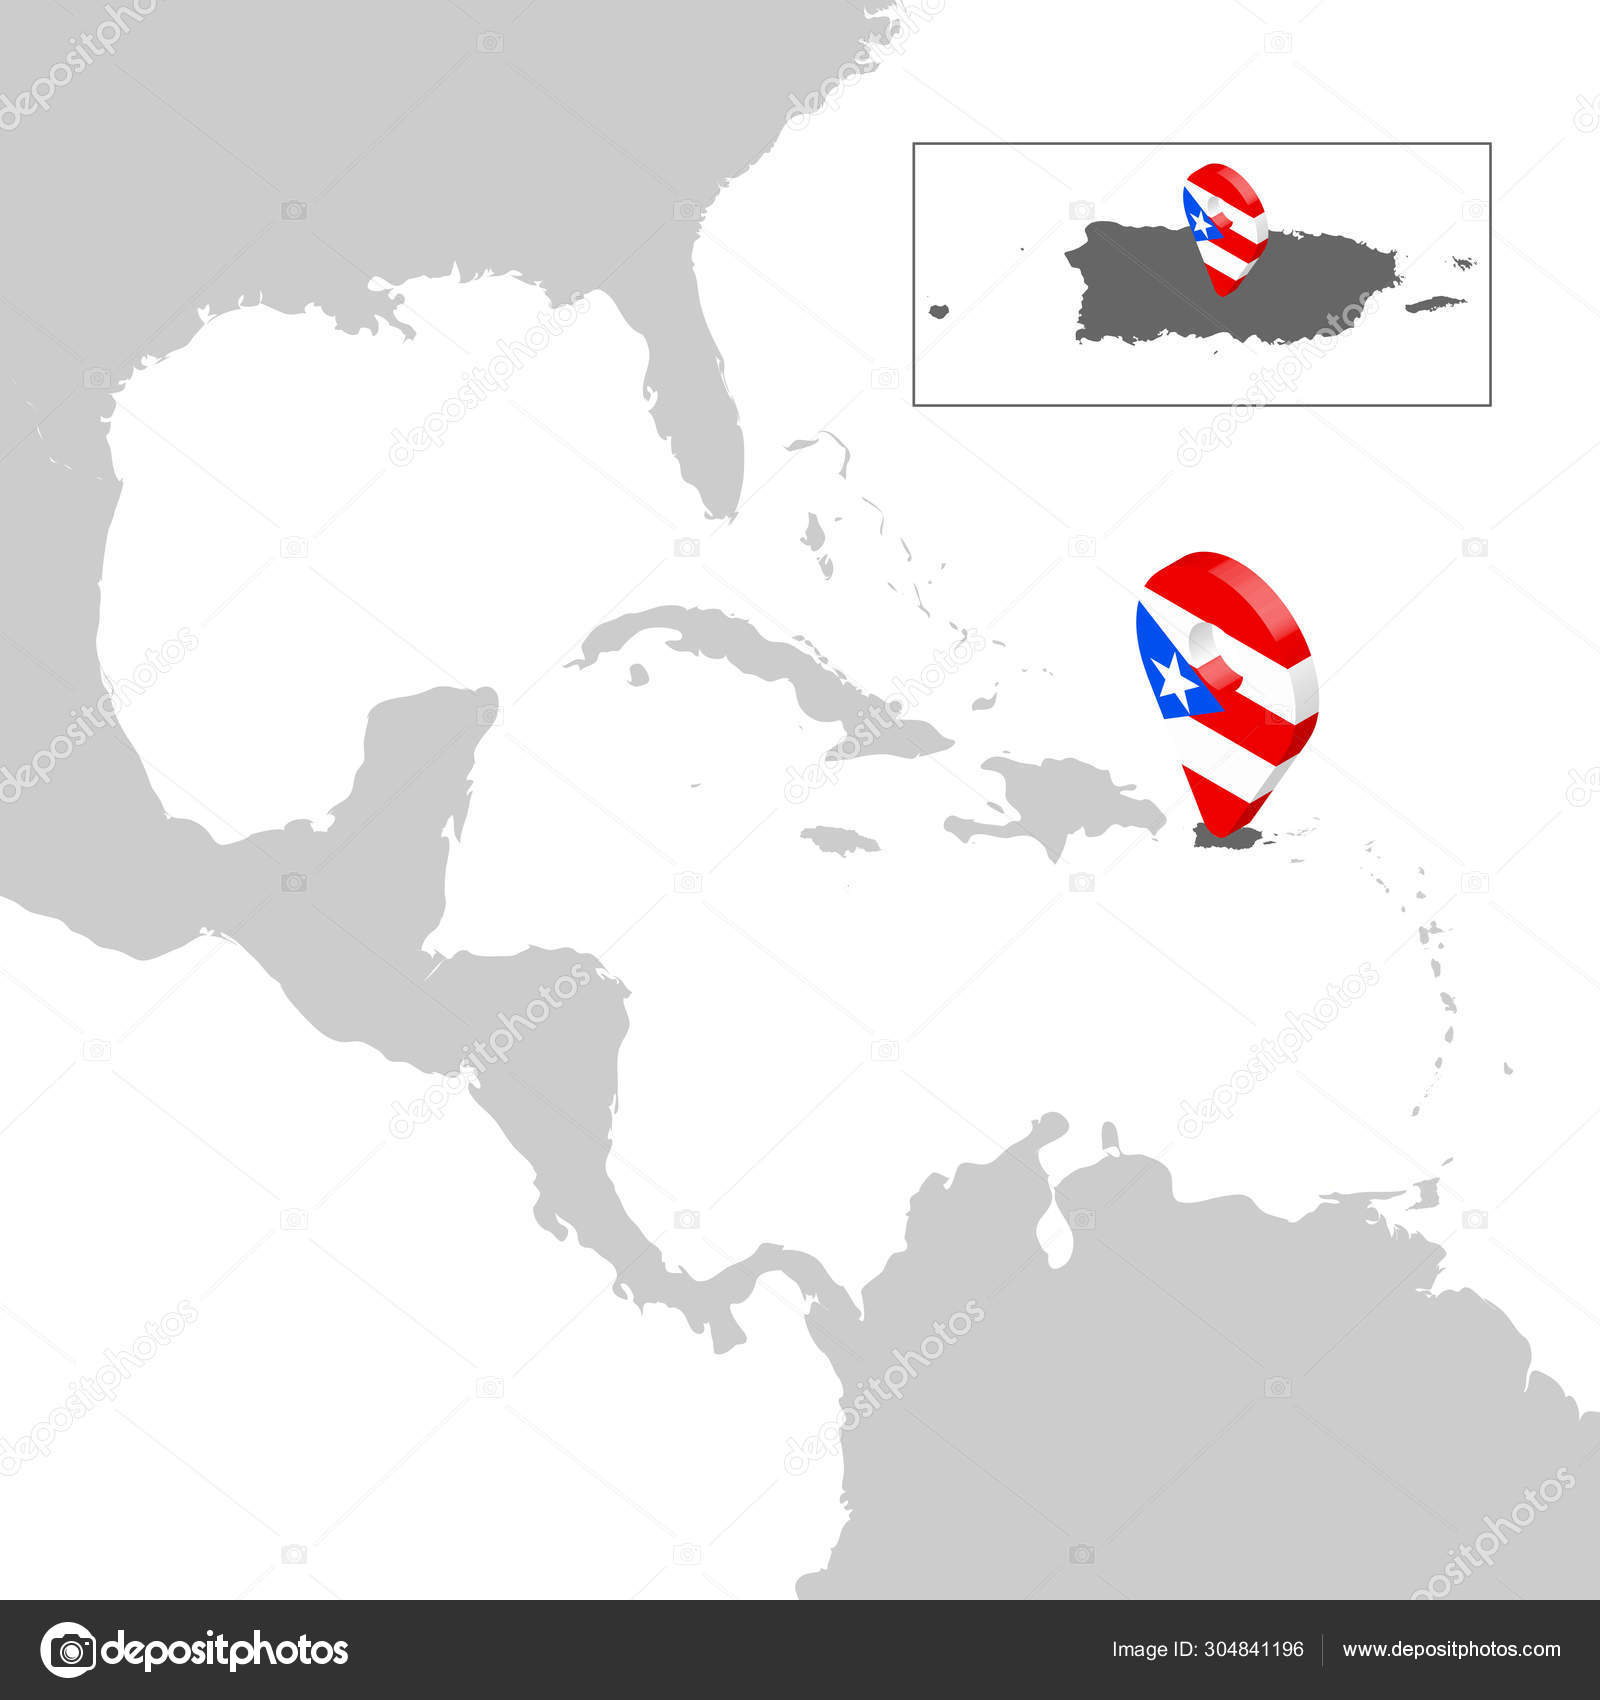 Location Map HondurasPuerto Rico on map Central America. 3d ...